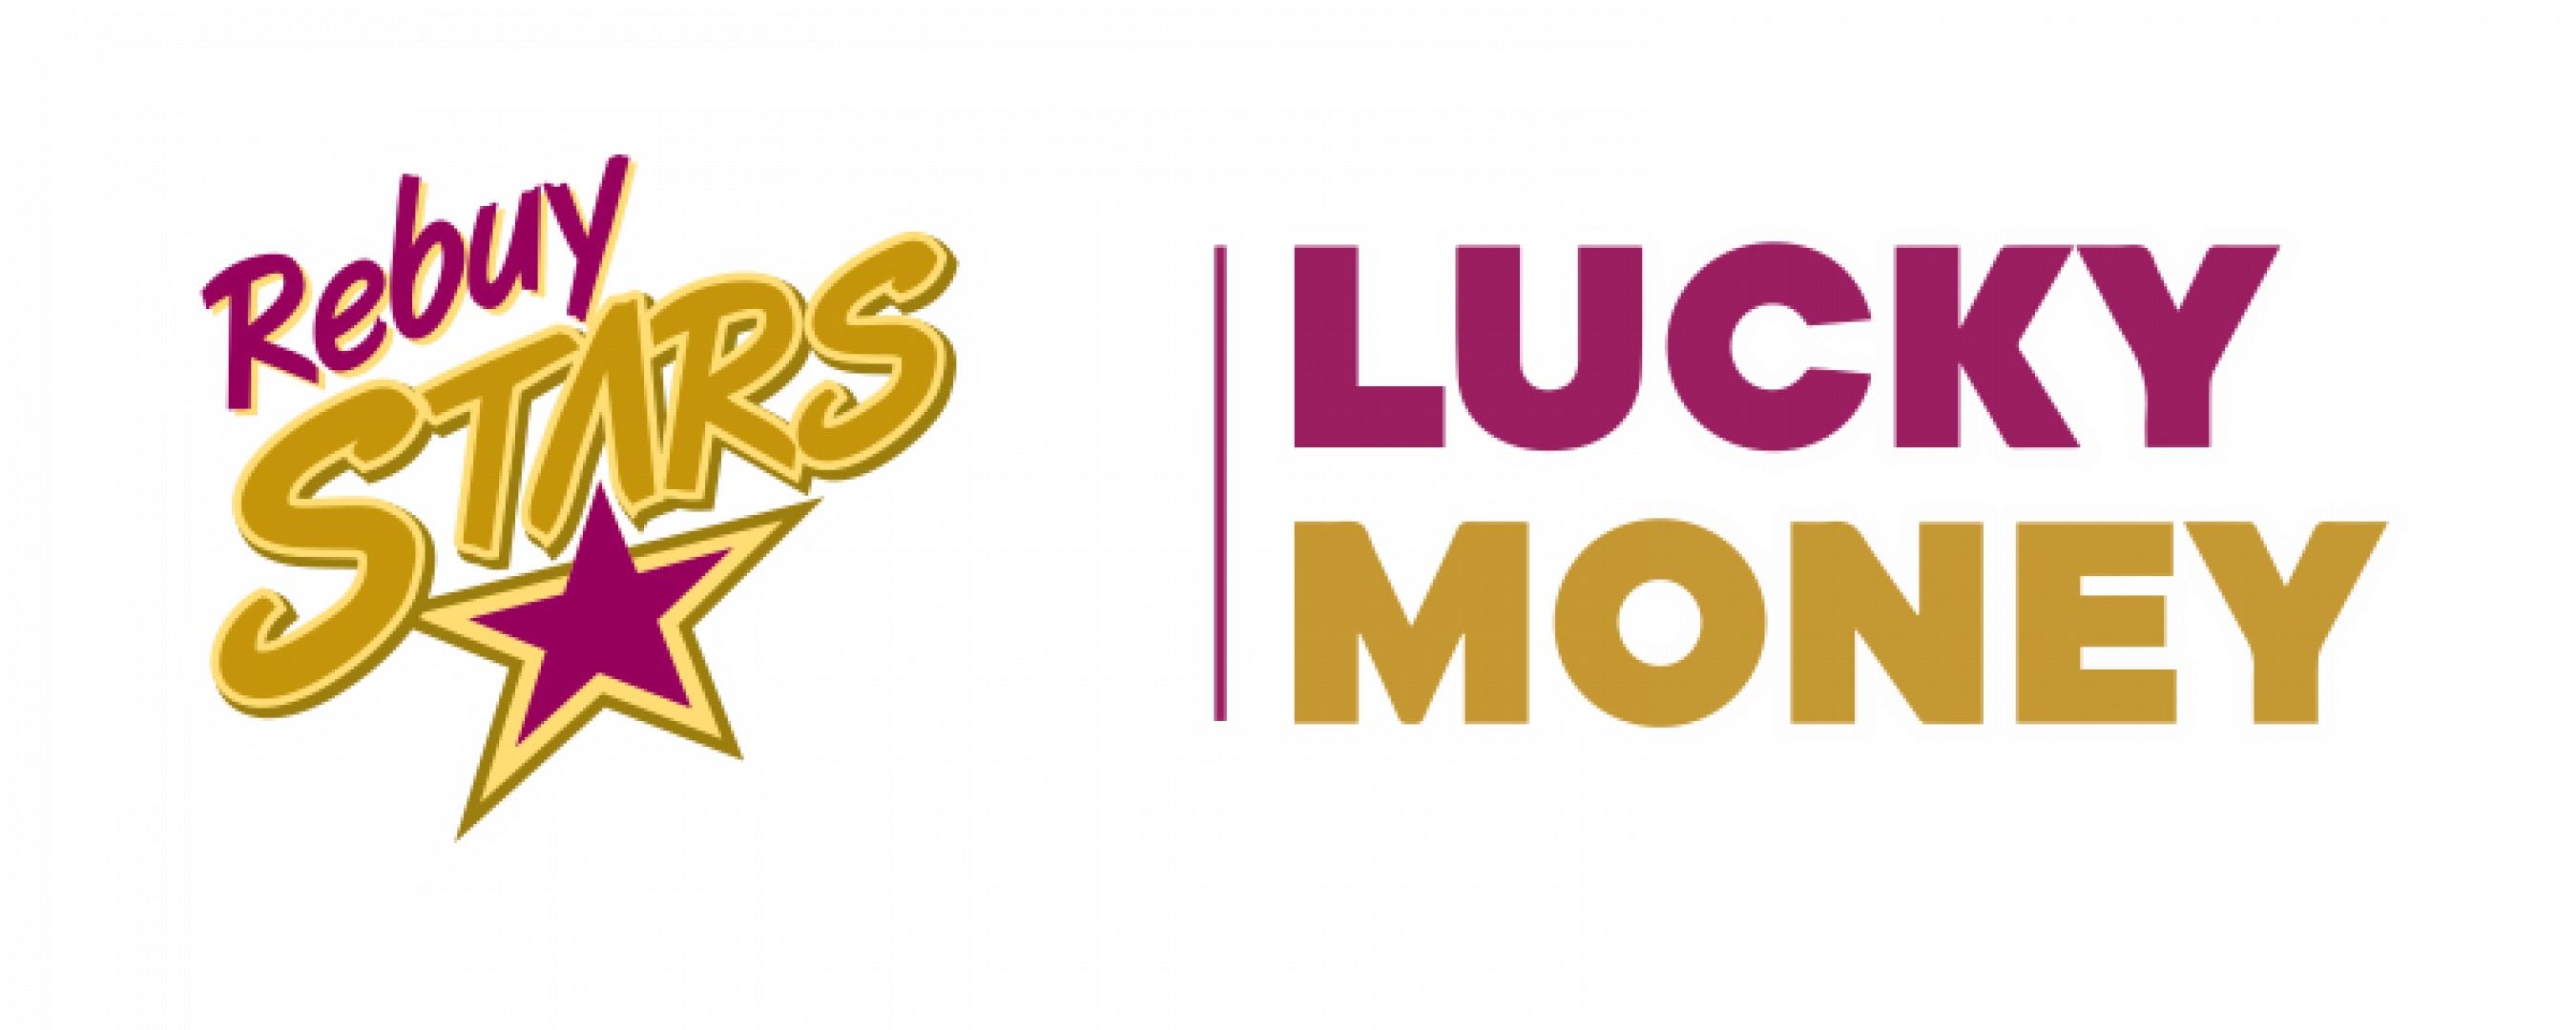 Logo_RebuyStars+LuckyMoney.png